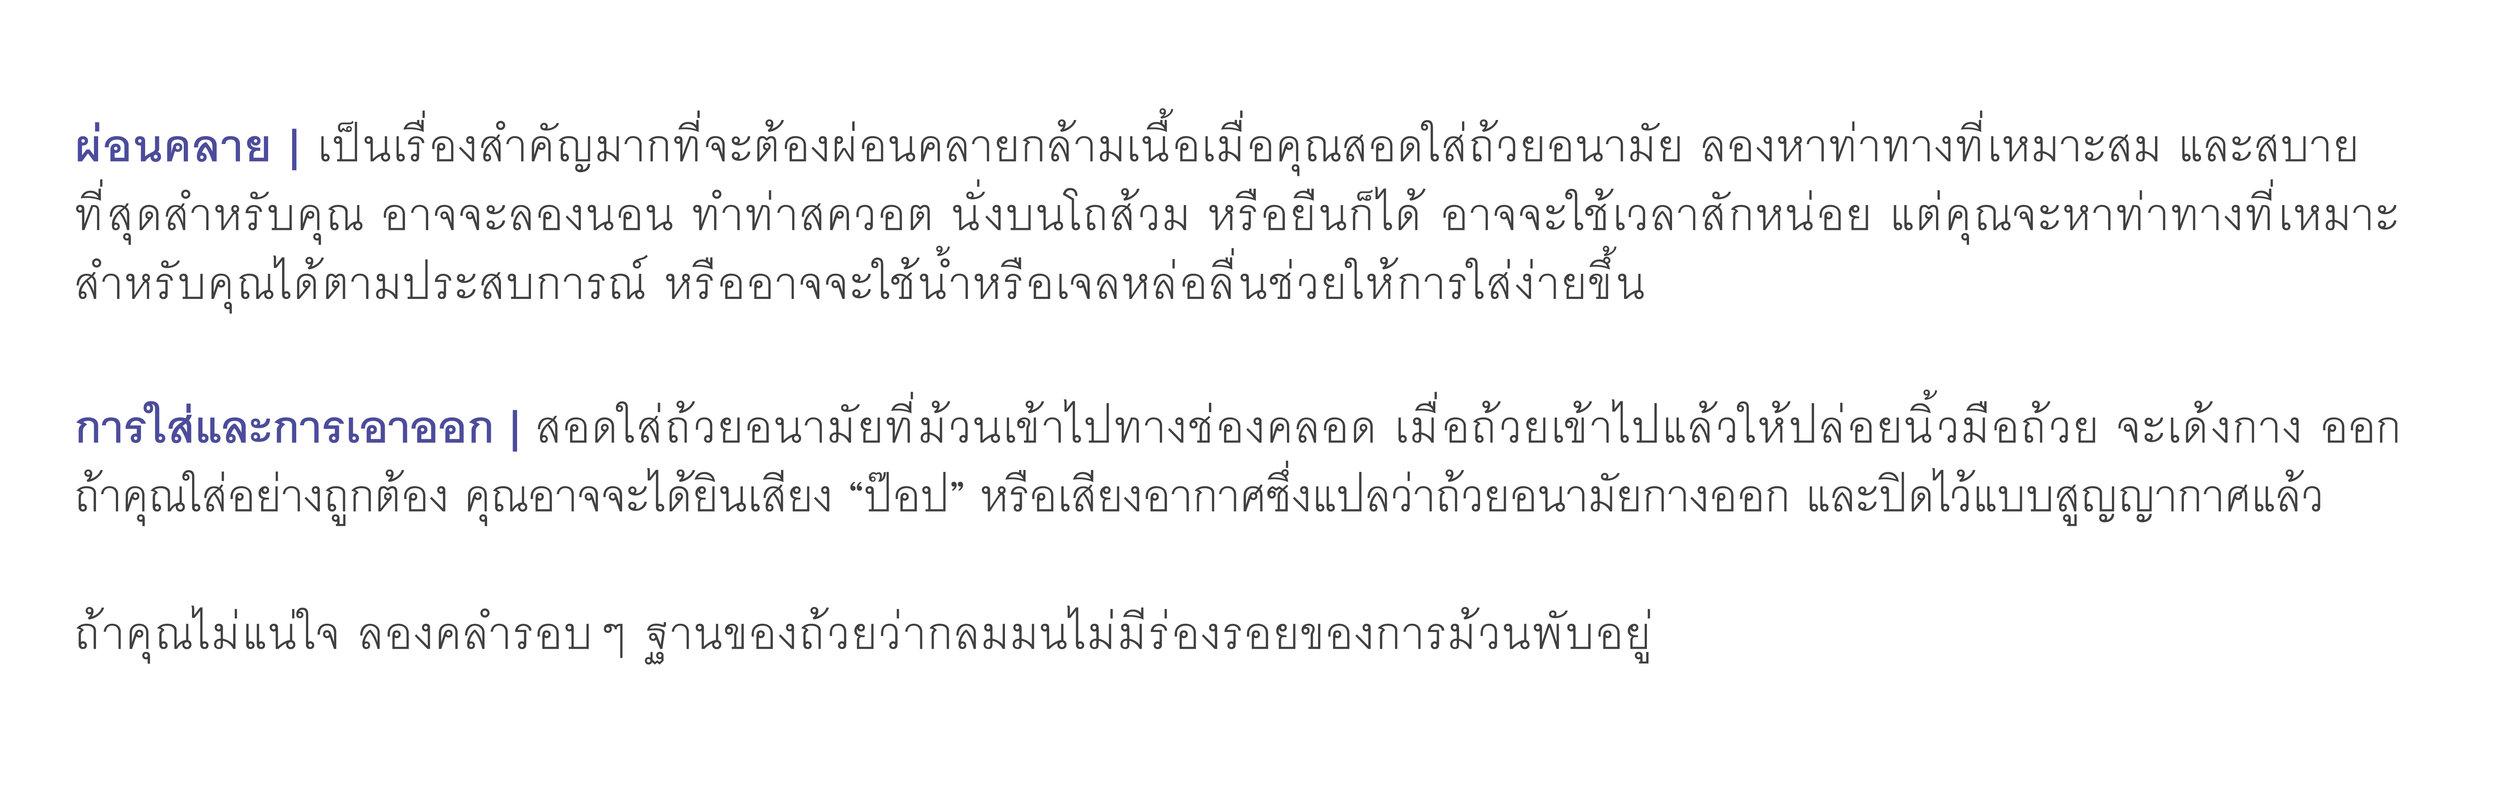 Organicup line AWCO-04.jpg